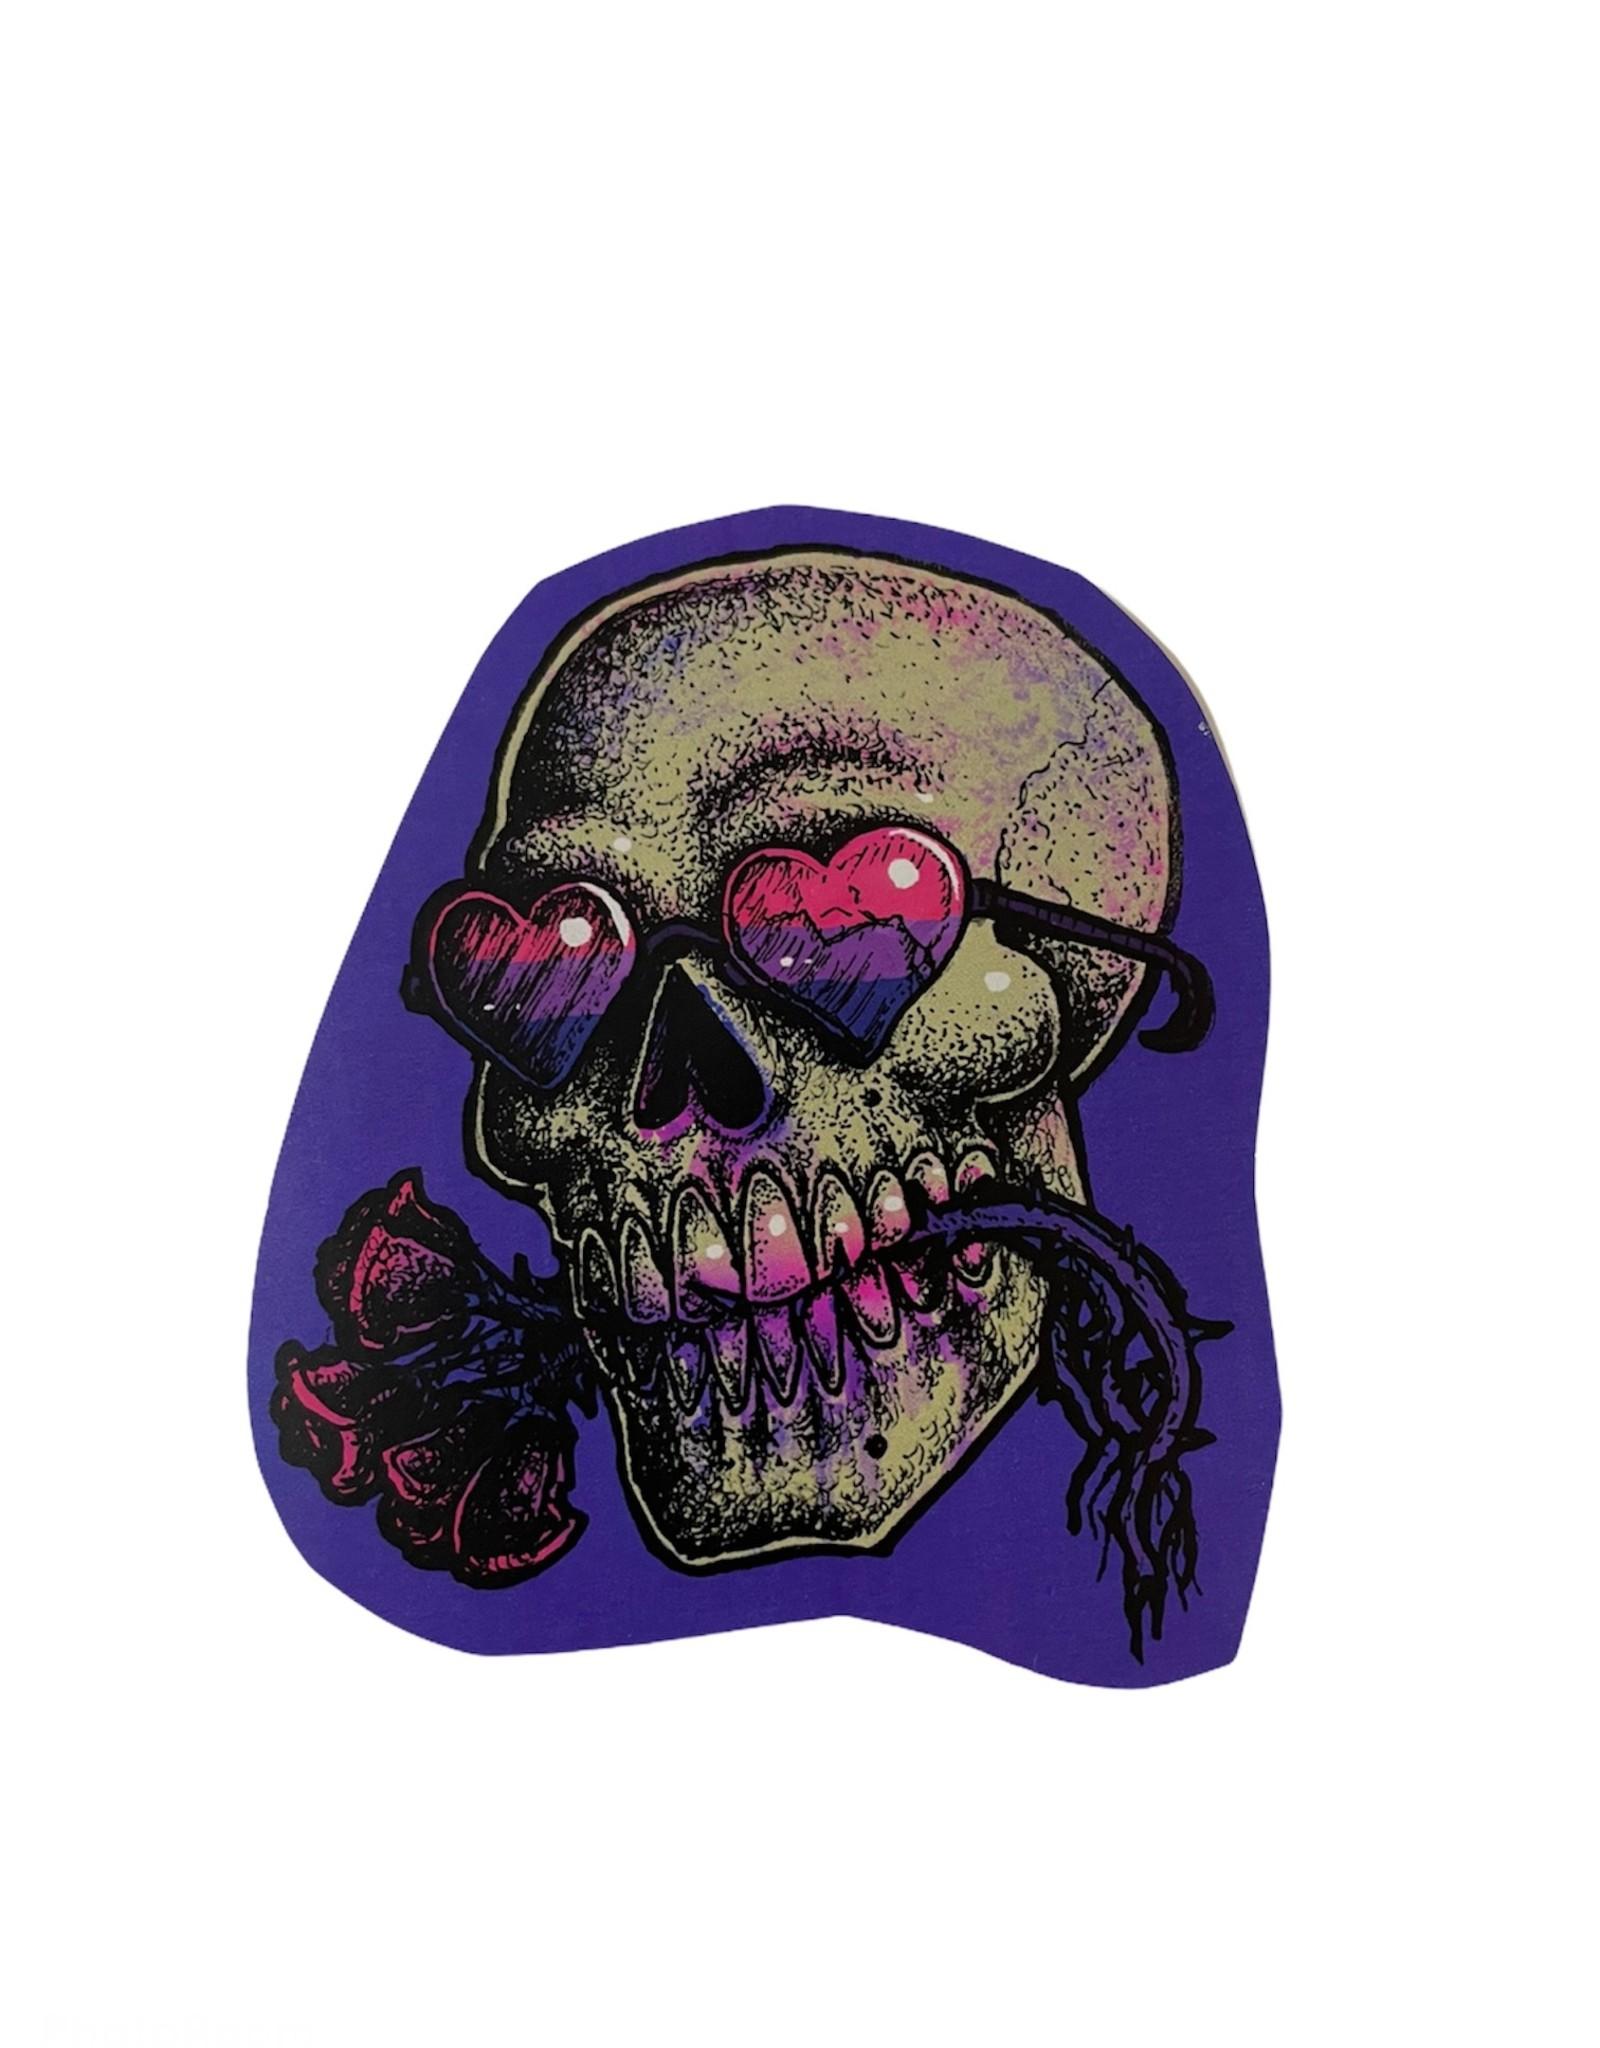 """Gay Horror!"" Bi Skull Sticker by The Miasma"